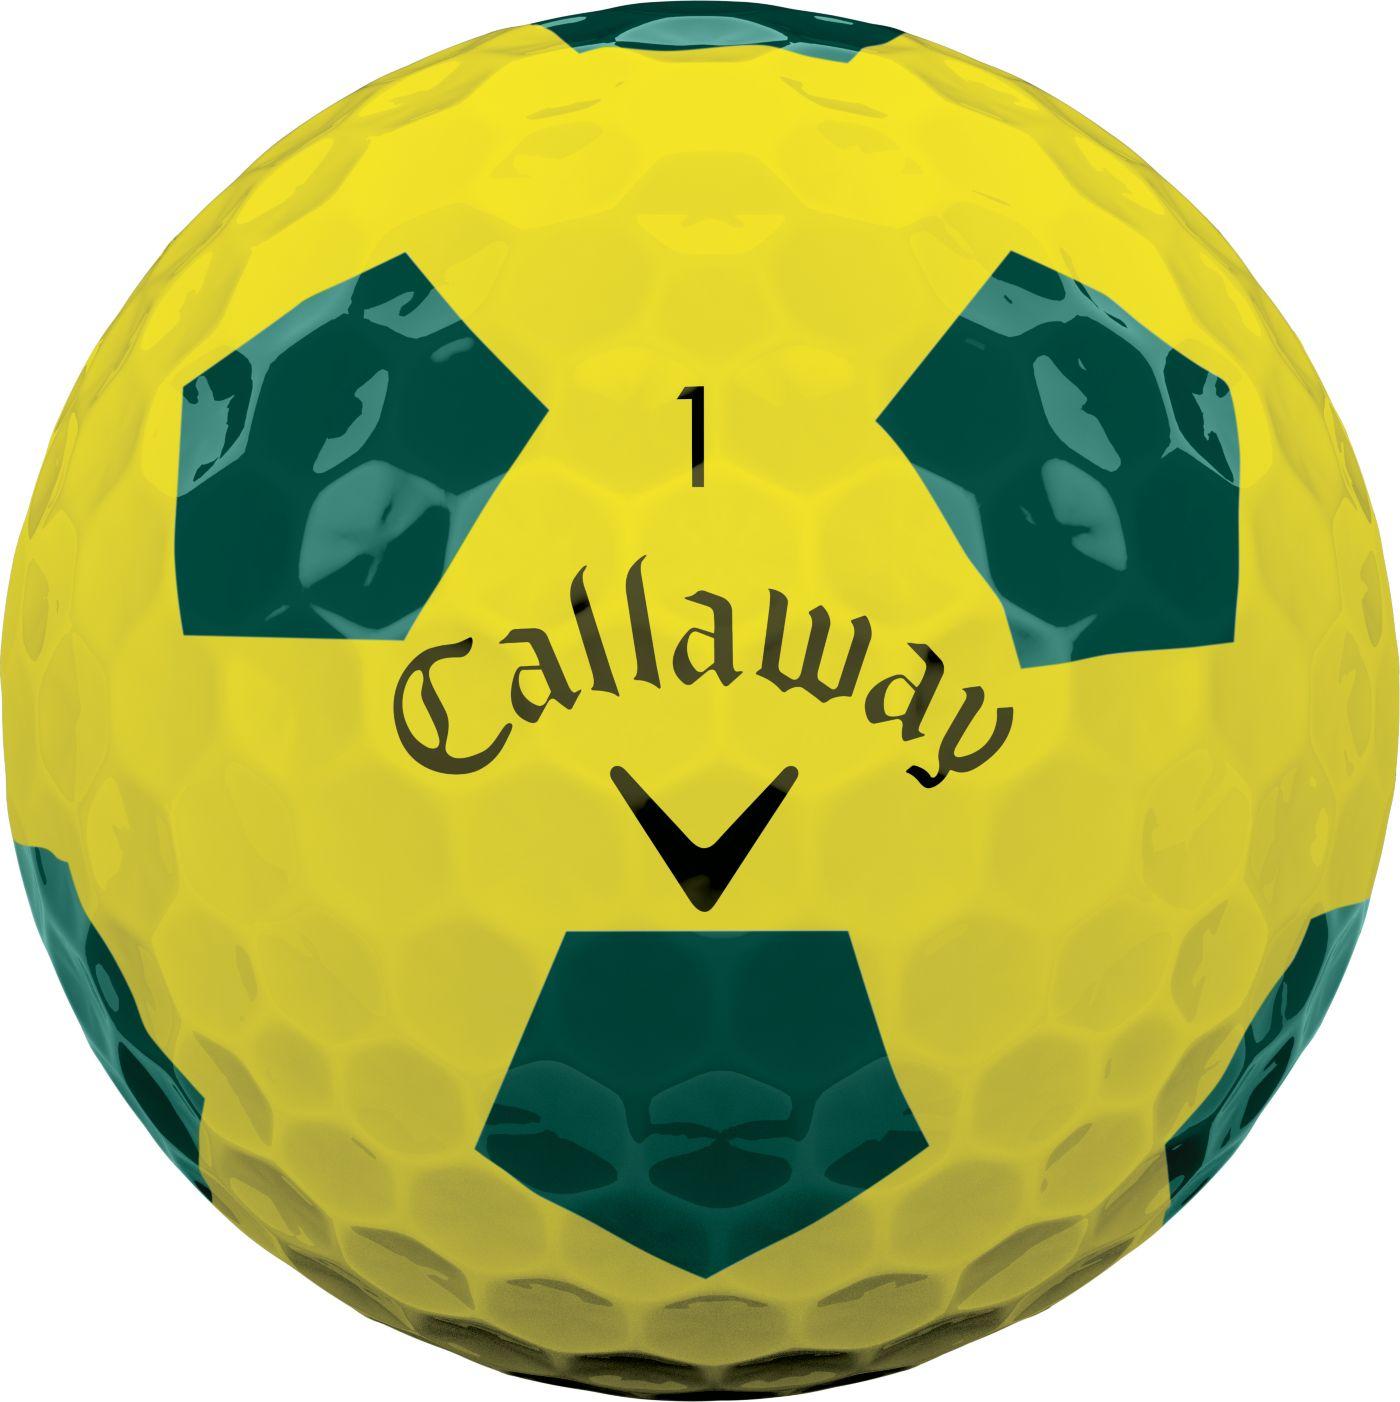 Callaway 2018 Chrome Soft Truvis Yellow Golf Balls – Sports Matter Special Edition